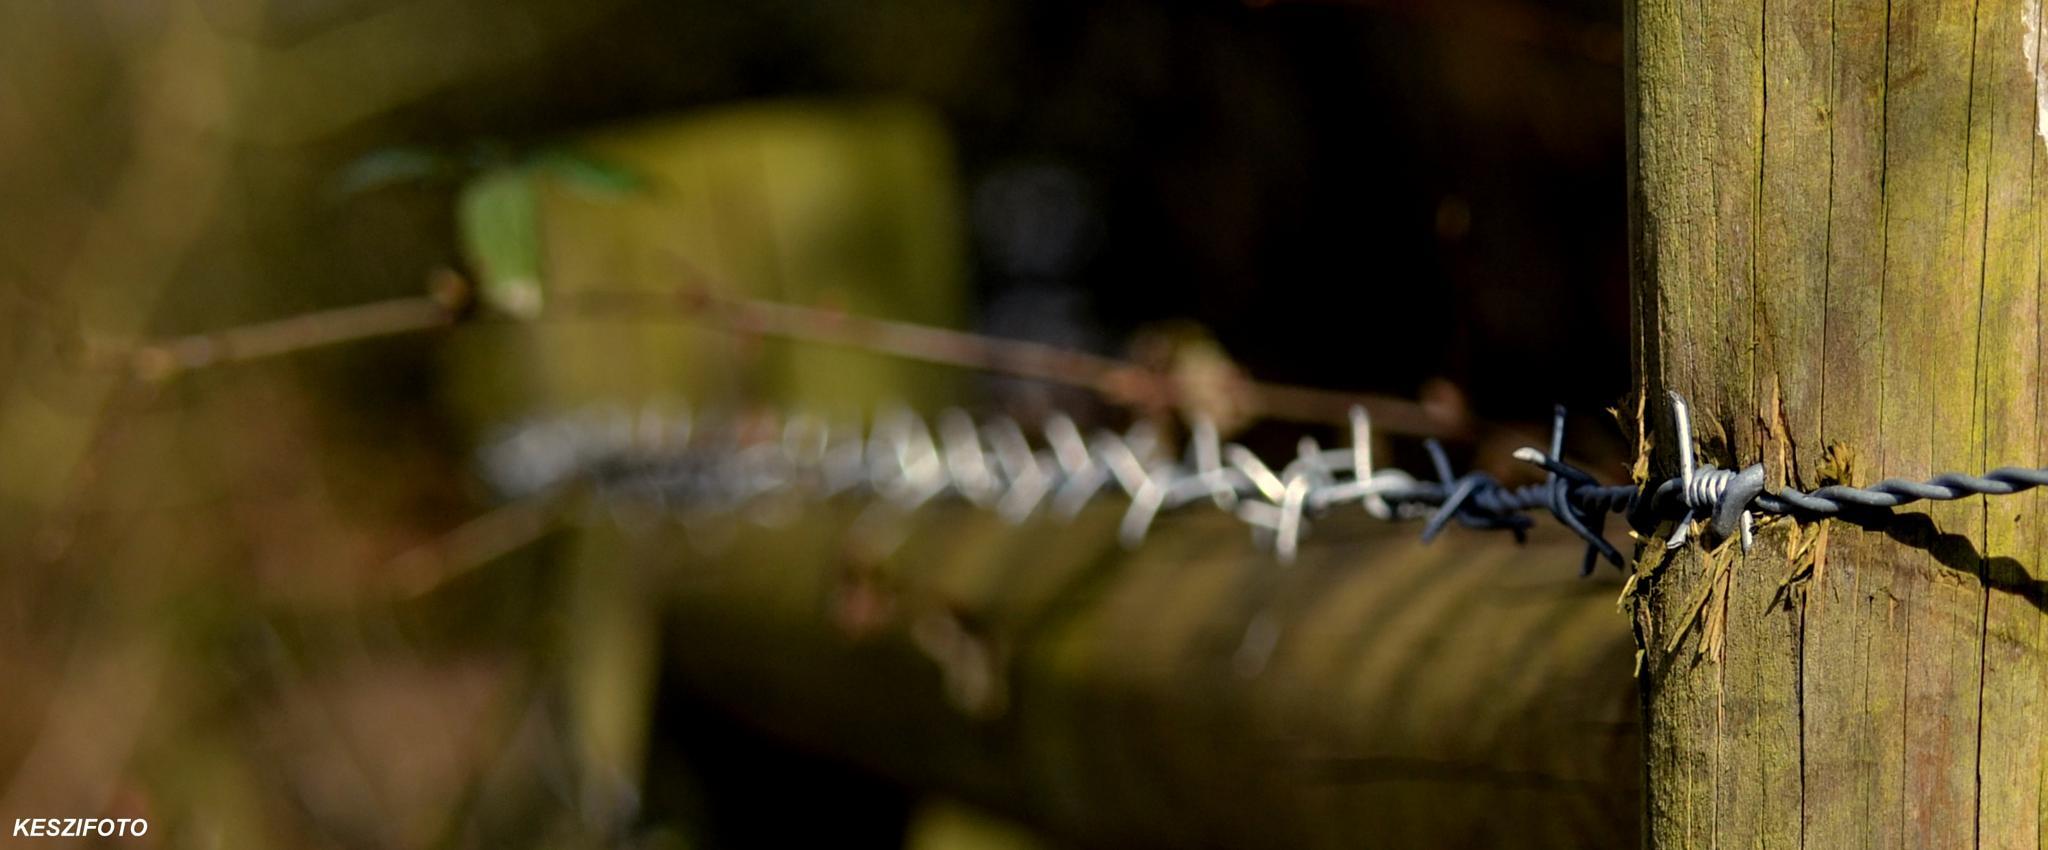 Barbed wire by Jozsef Keszan